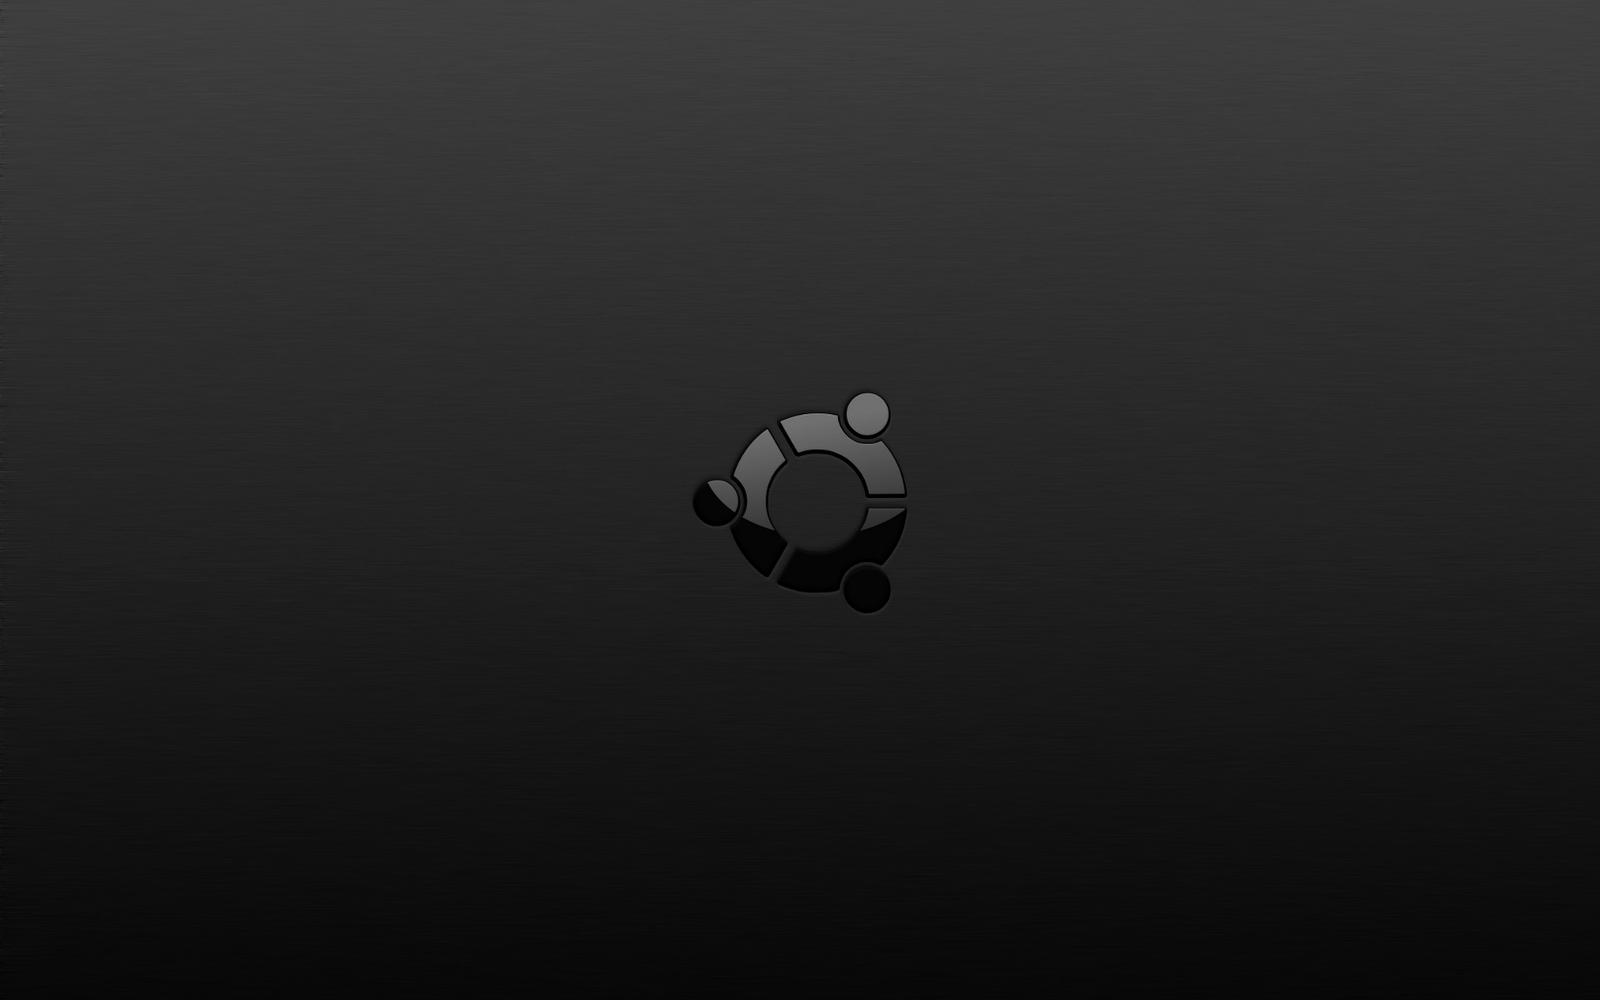 Free Wallpicz: Linux Desktop Wallpaper Hd